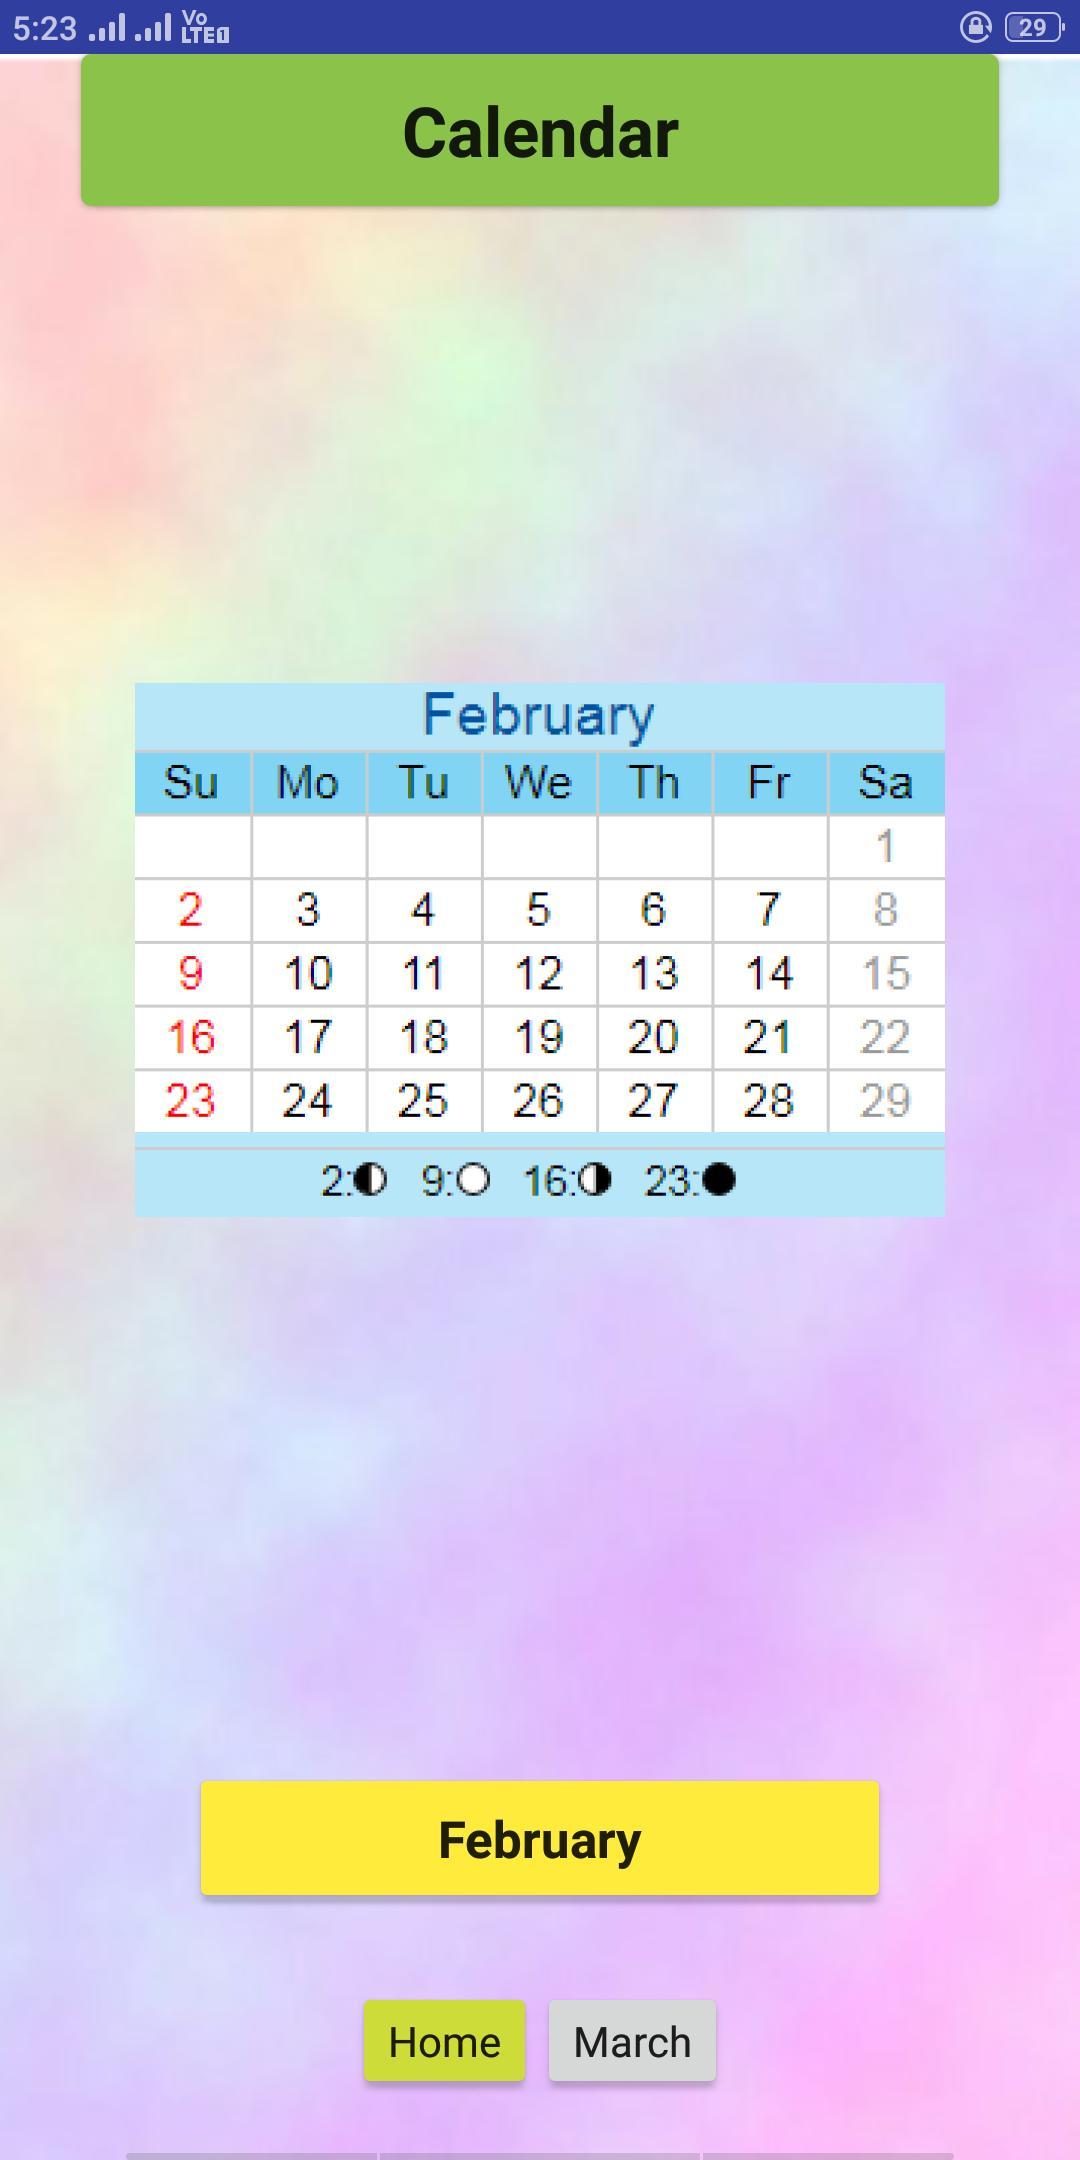 Hindu Calendar 2020 March.Kalnirnay Calendar 2020 March Hindu Panchang 2020 Panchangam